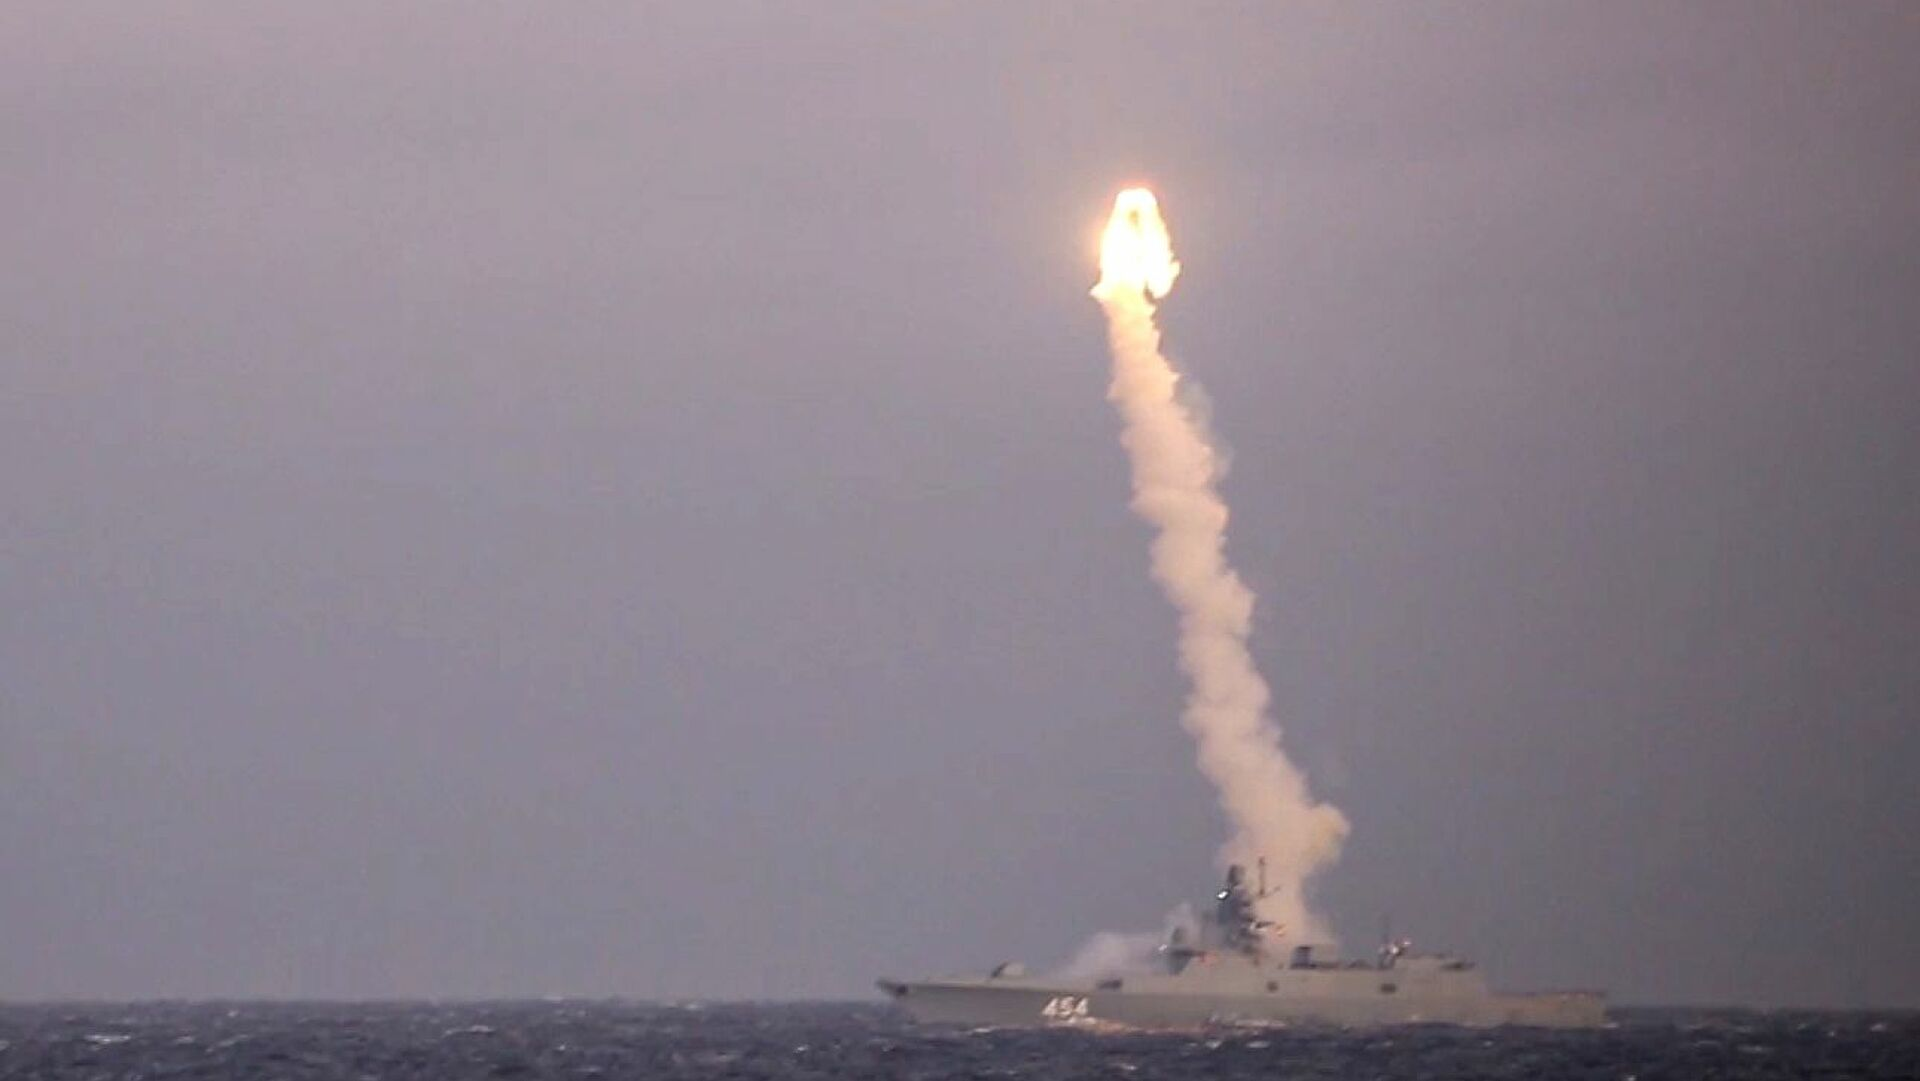 russiasuccessfullytestfireszirkonhypersoniccruisemissilefromnuclearsubmarine